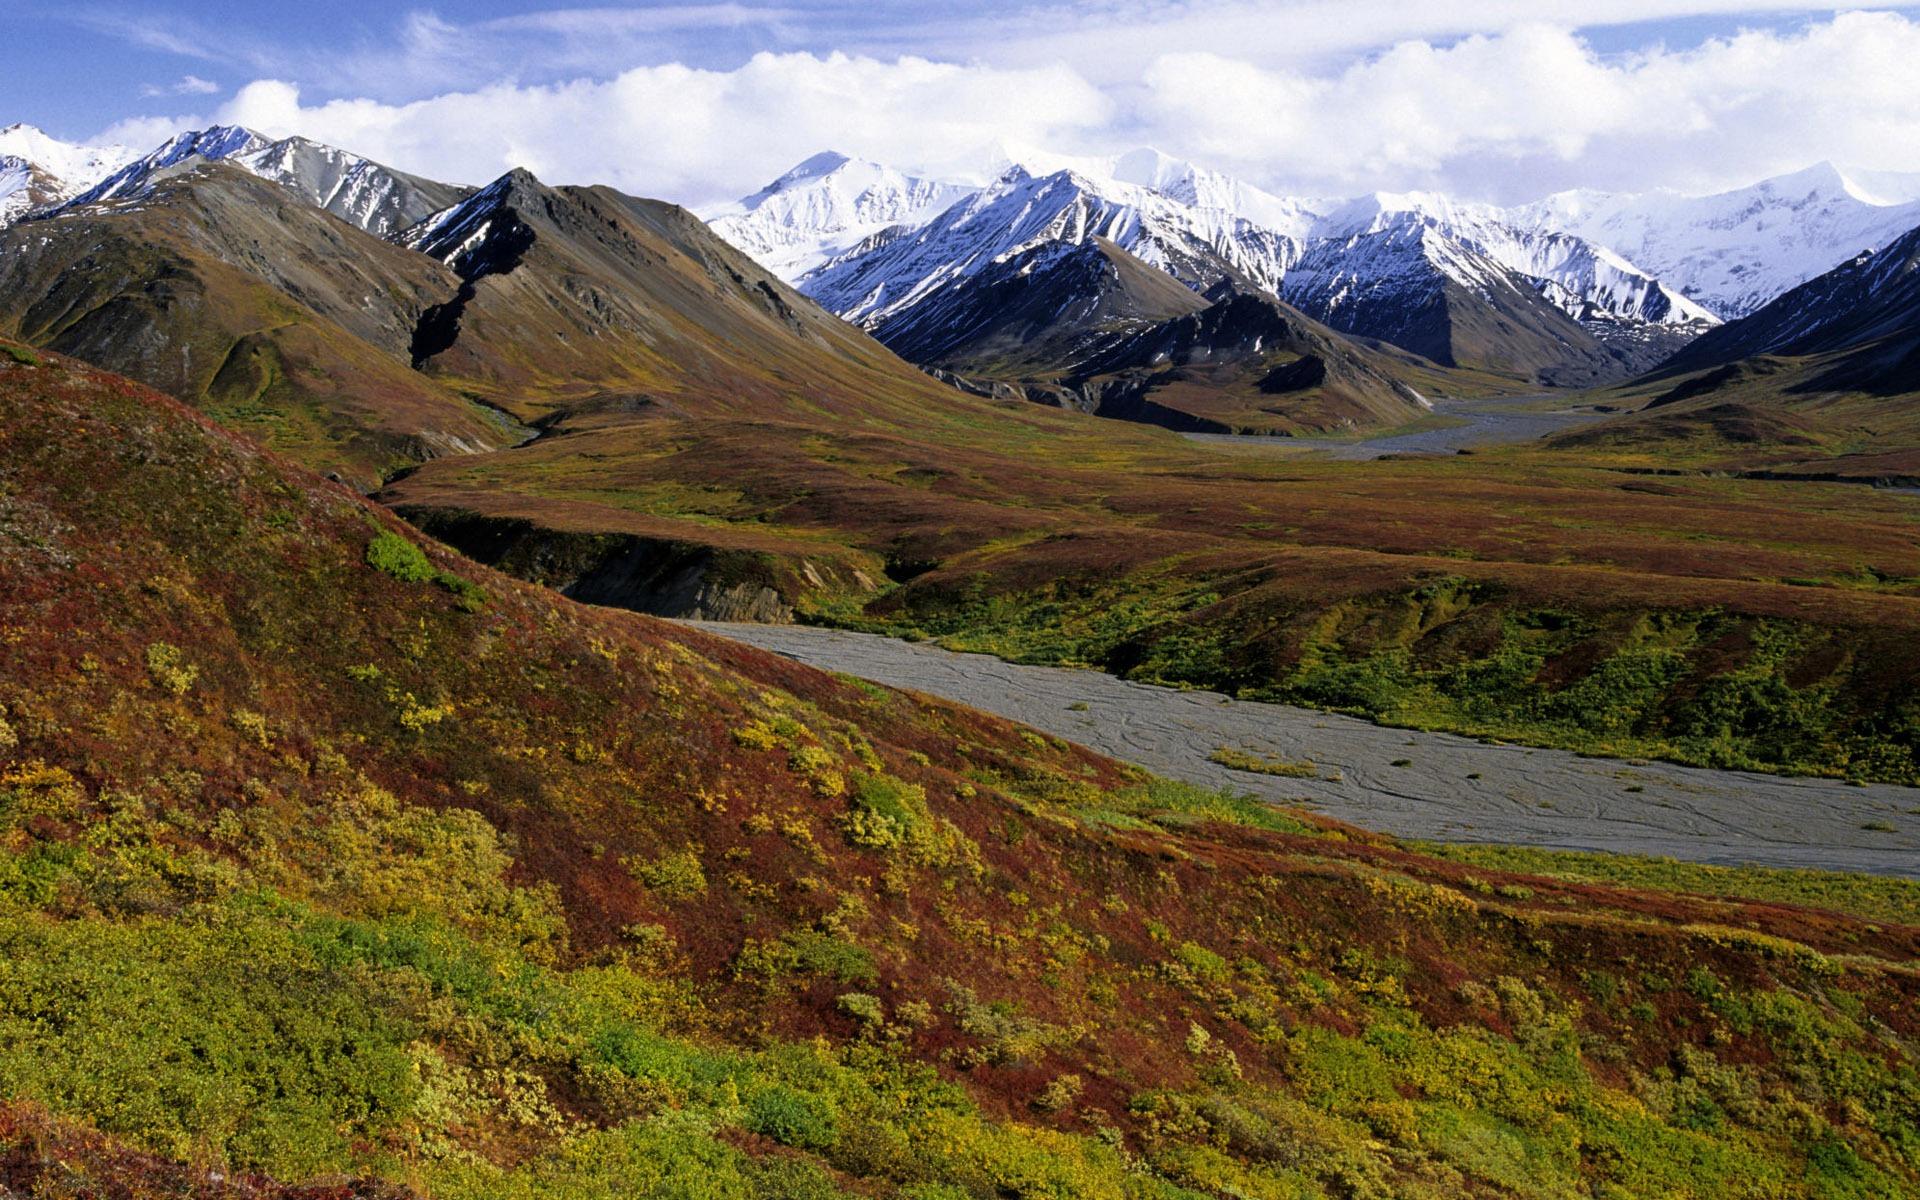 Alaska Scenery wallpaper 1920x1200